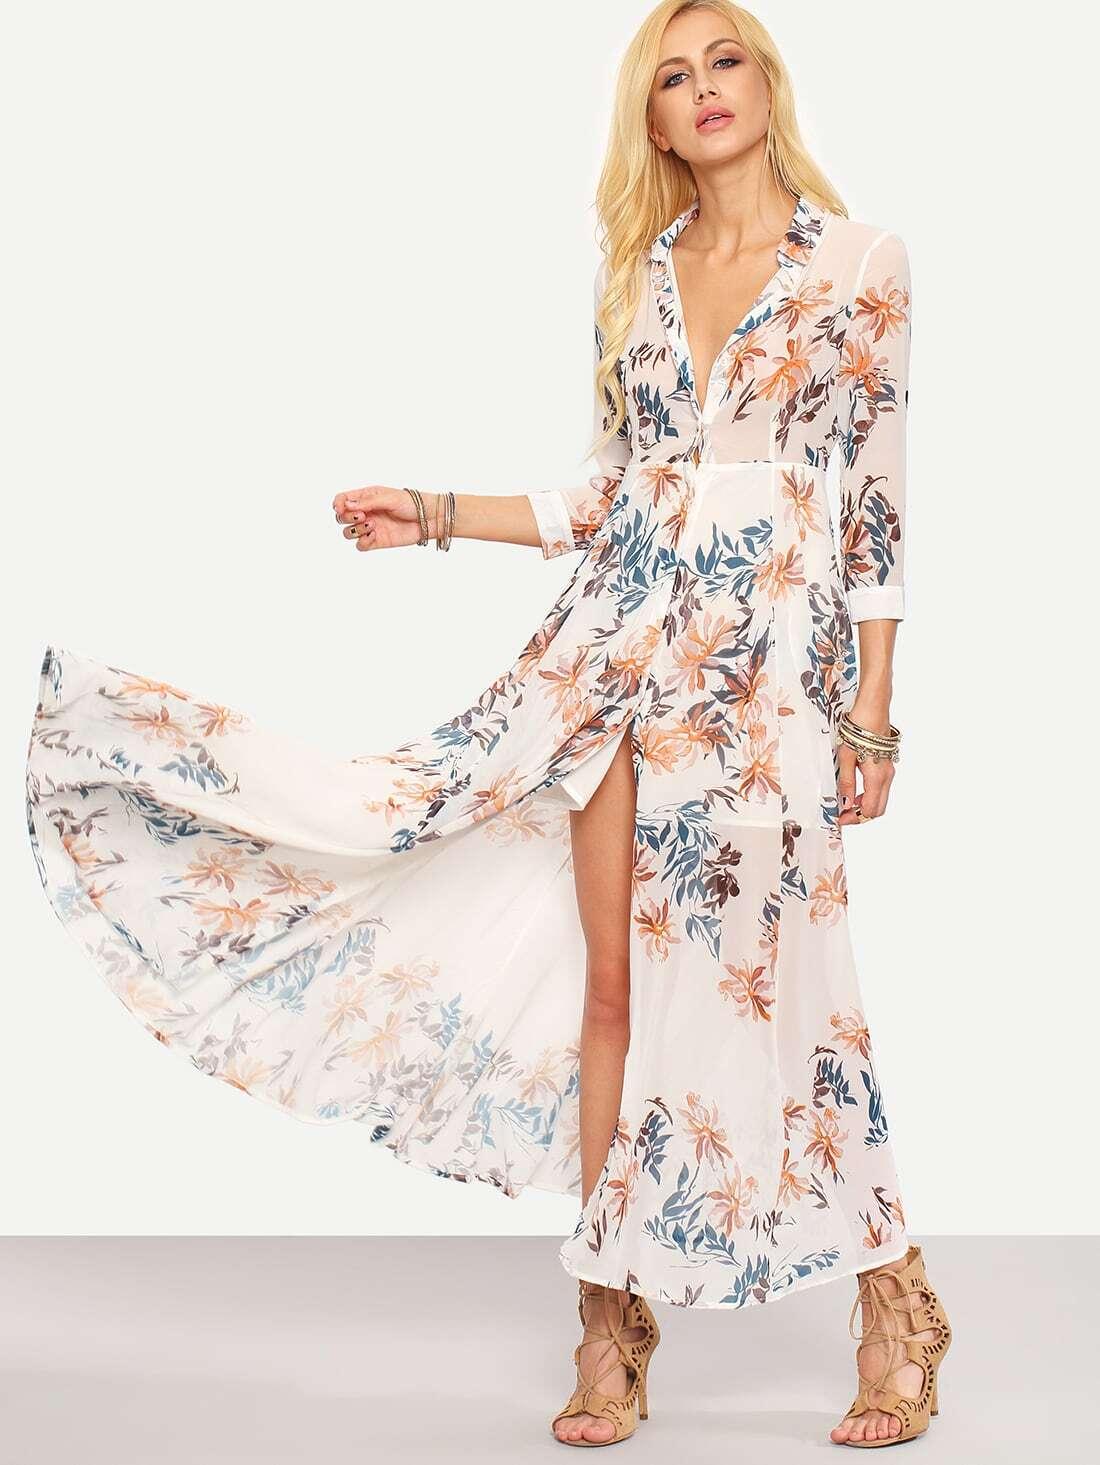 Flower Print Chiffon Long Shirt Dress White Emmacloth Women Fast